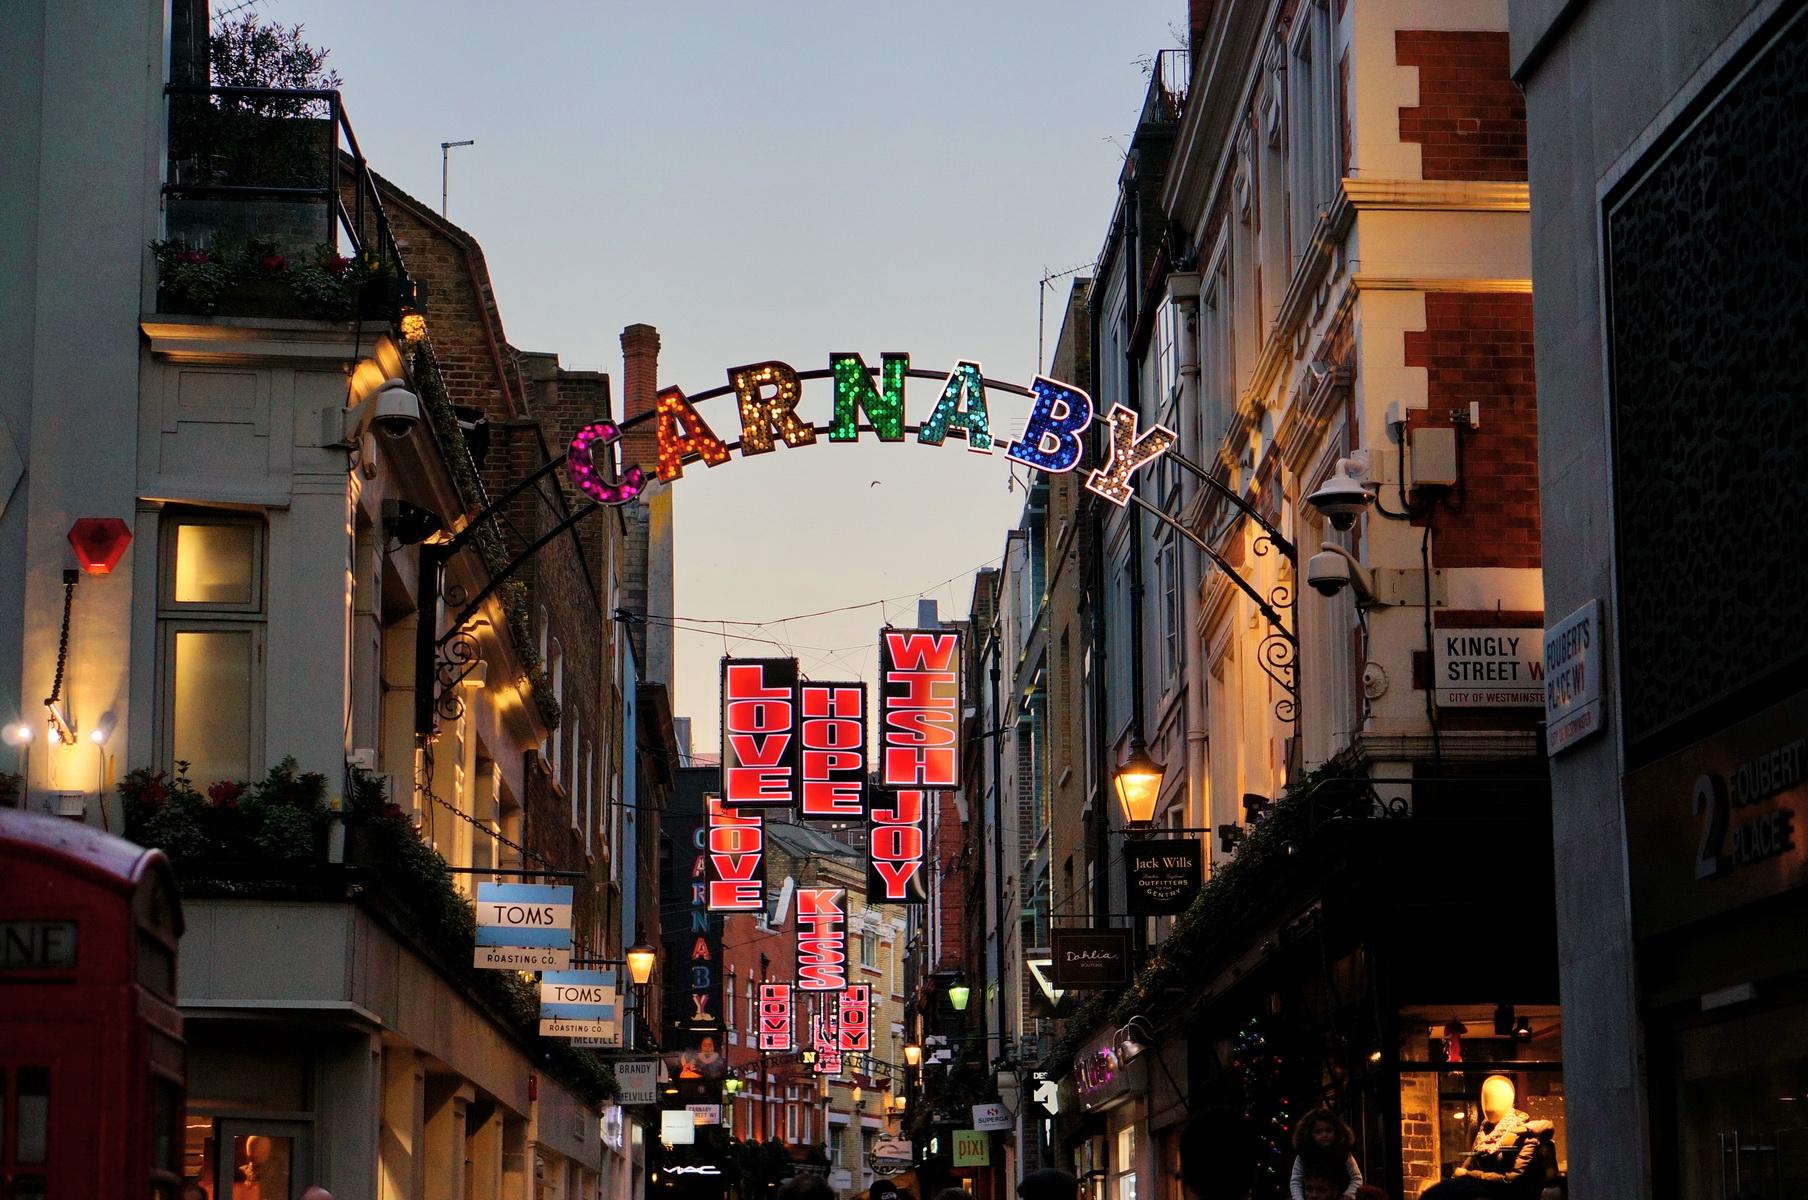 londres, london, soho, carnaby street, christmas lights, christmas spirit